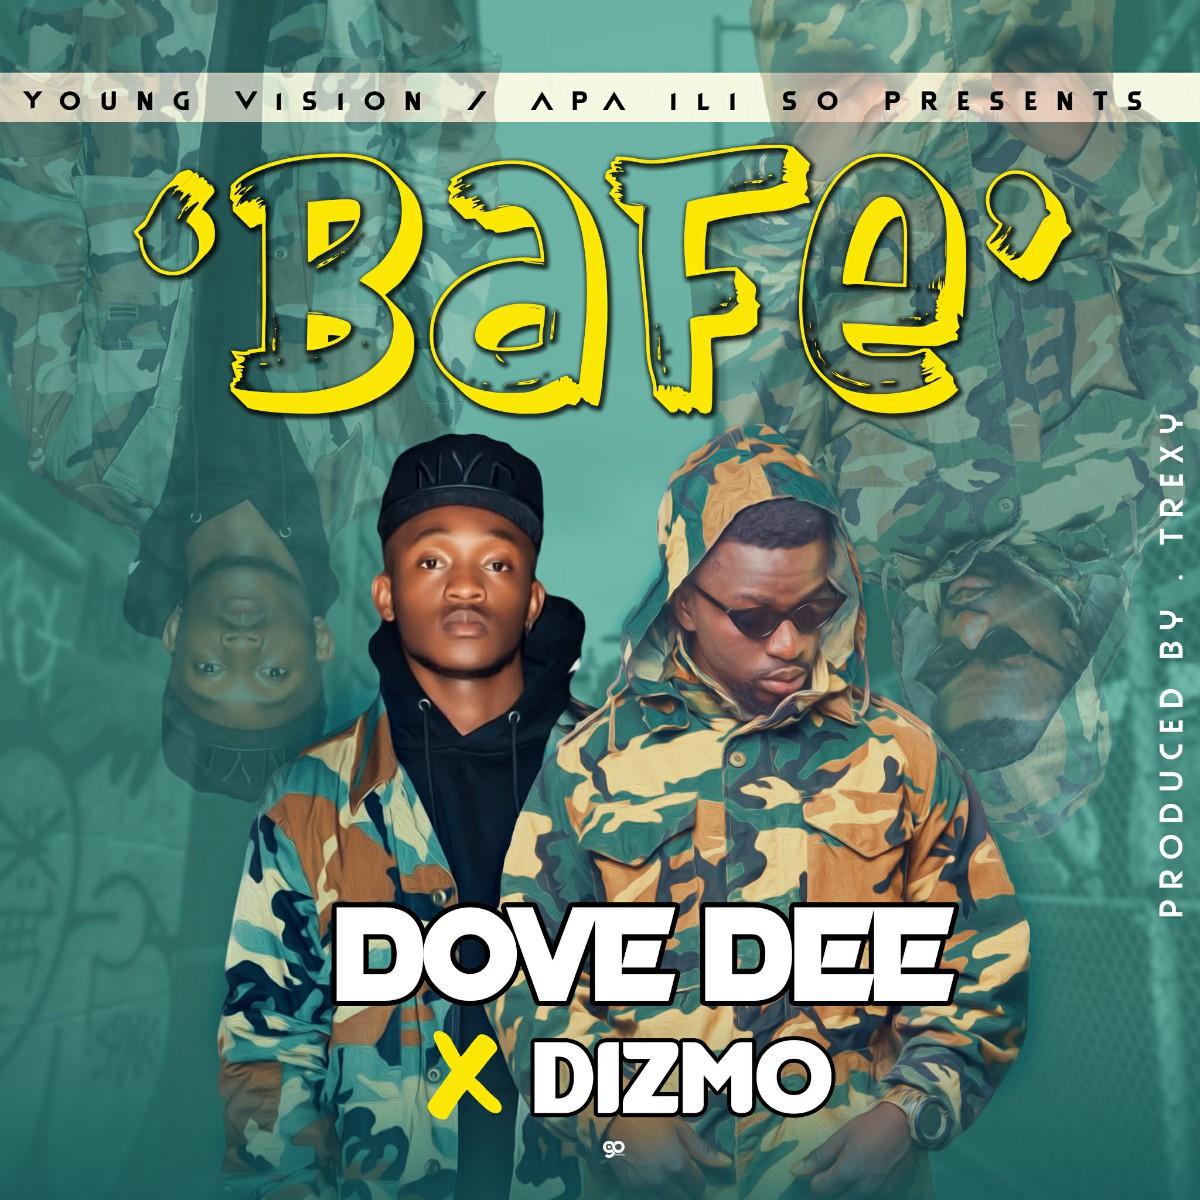 Dove Dee ft. Dizmo - Bafe